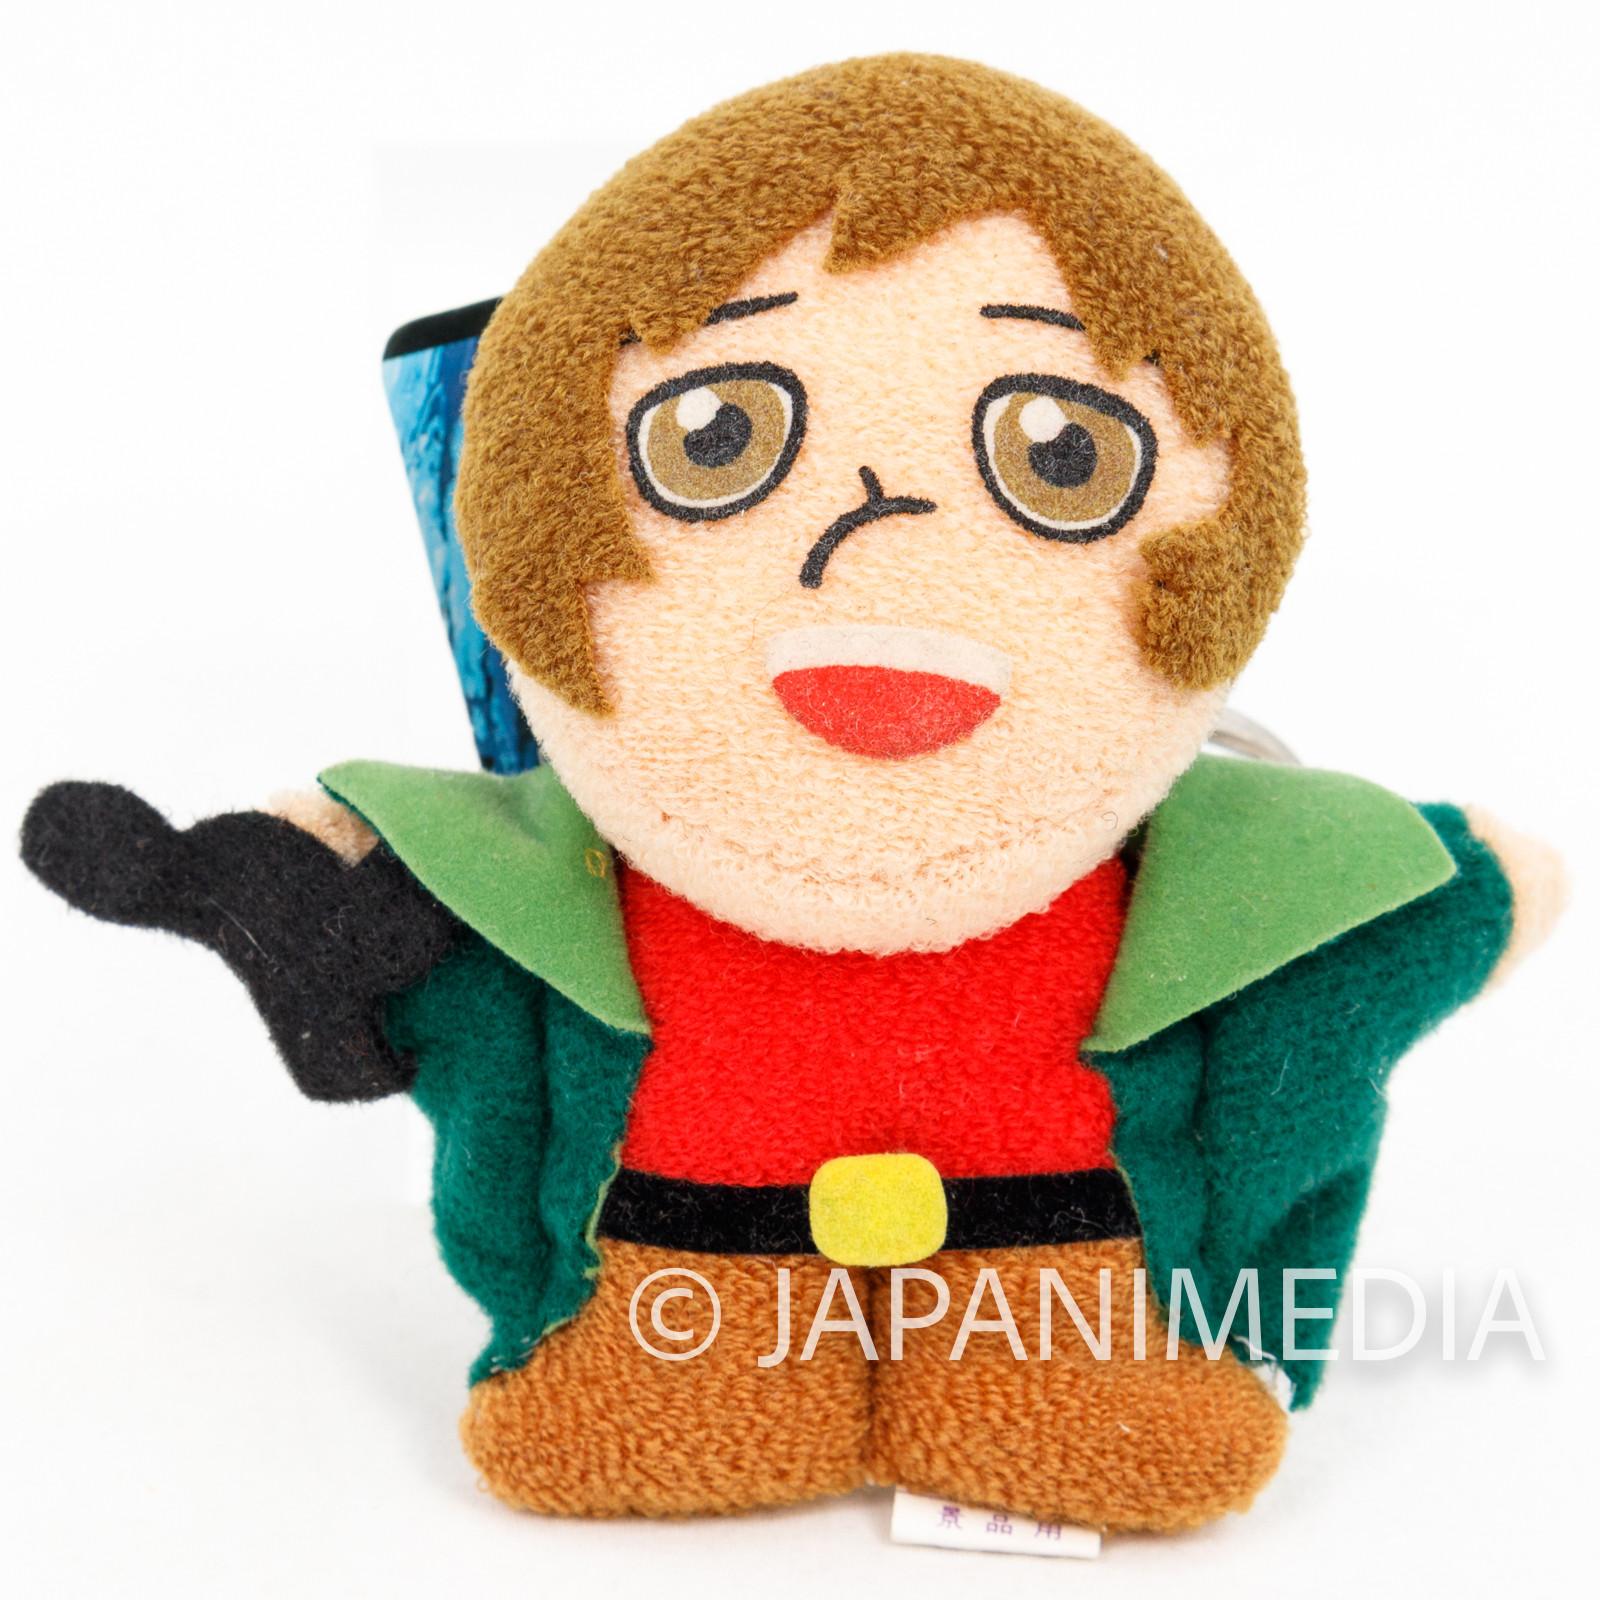 Galaxy Express 999 Tetsuo Hoshino Plush Doll Figure Keychain Banpresto